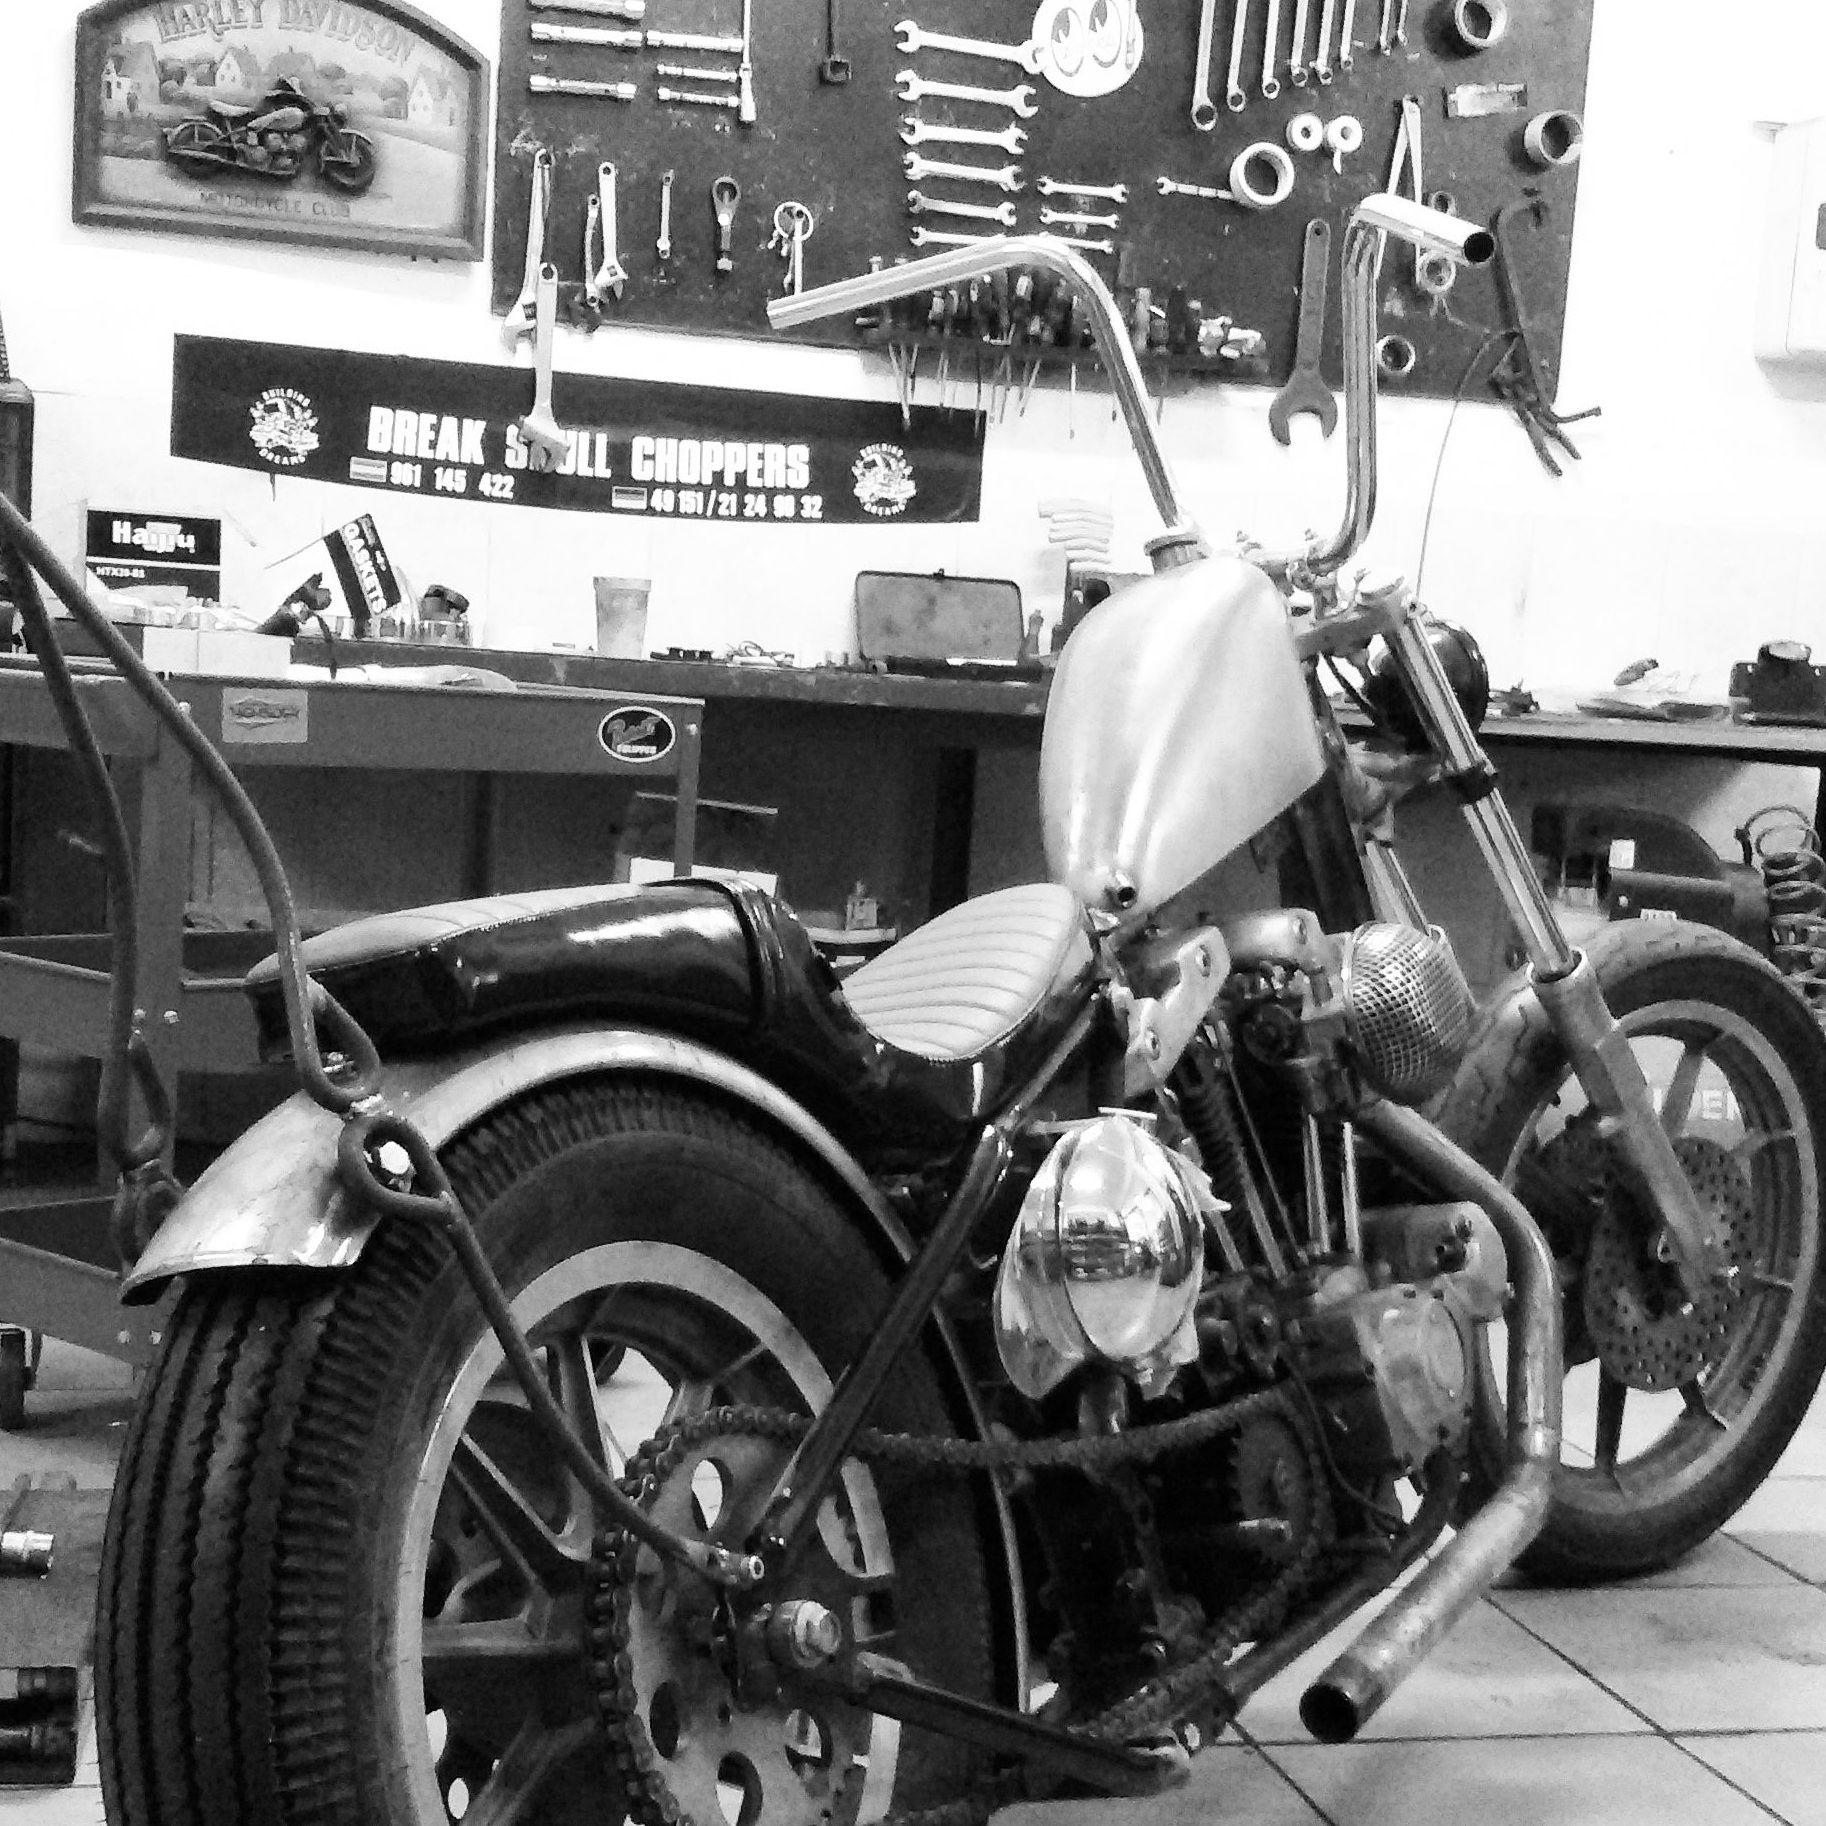 harley davidson,ironhead,customizar motos,transformacion harley davidson,venta harley davidson,choppers,bobbers